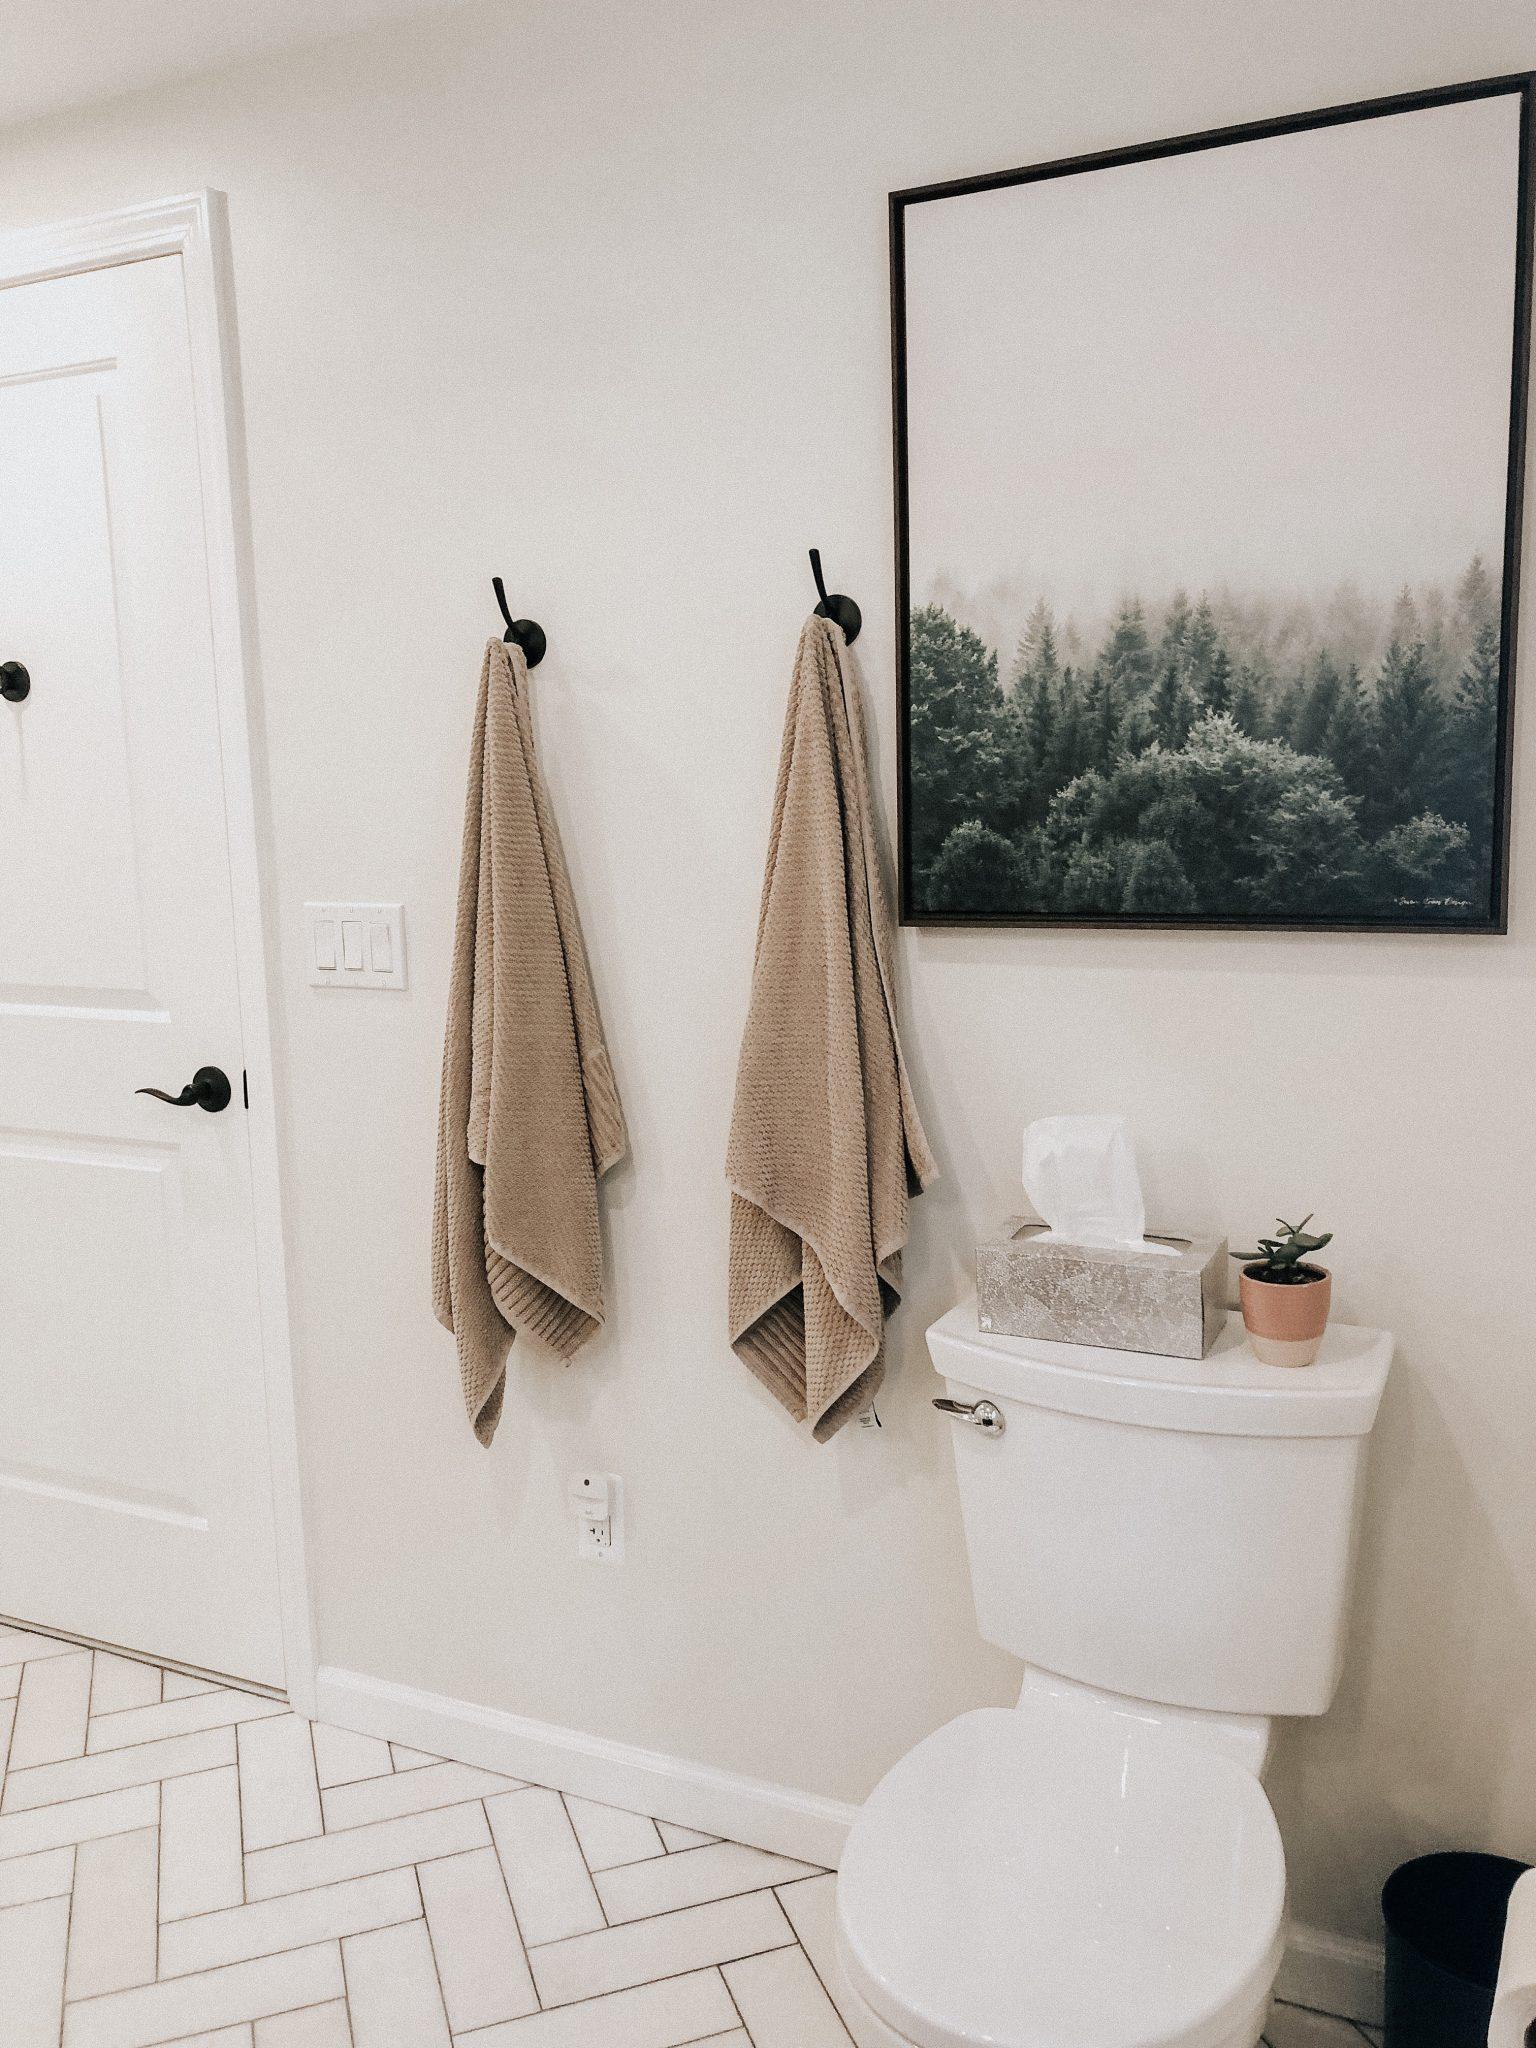 Master Bathroom Reveal | Daily Splendor Life and Style Blog | master bathroom #modernfarmhouse #modernfarmhousebathroom #Fixerupperstyle #contemporarybathroom #marbletile #subwaytile #behrpaint #behroffwhite #herringbonetilefloor #matteblackhooks